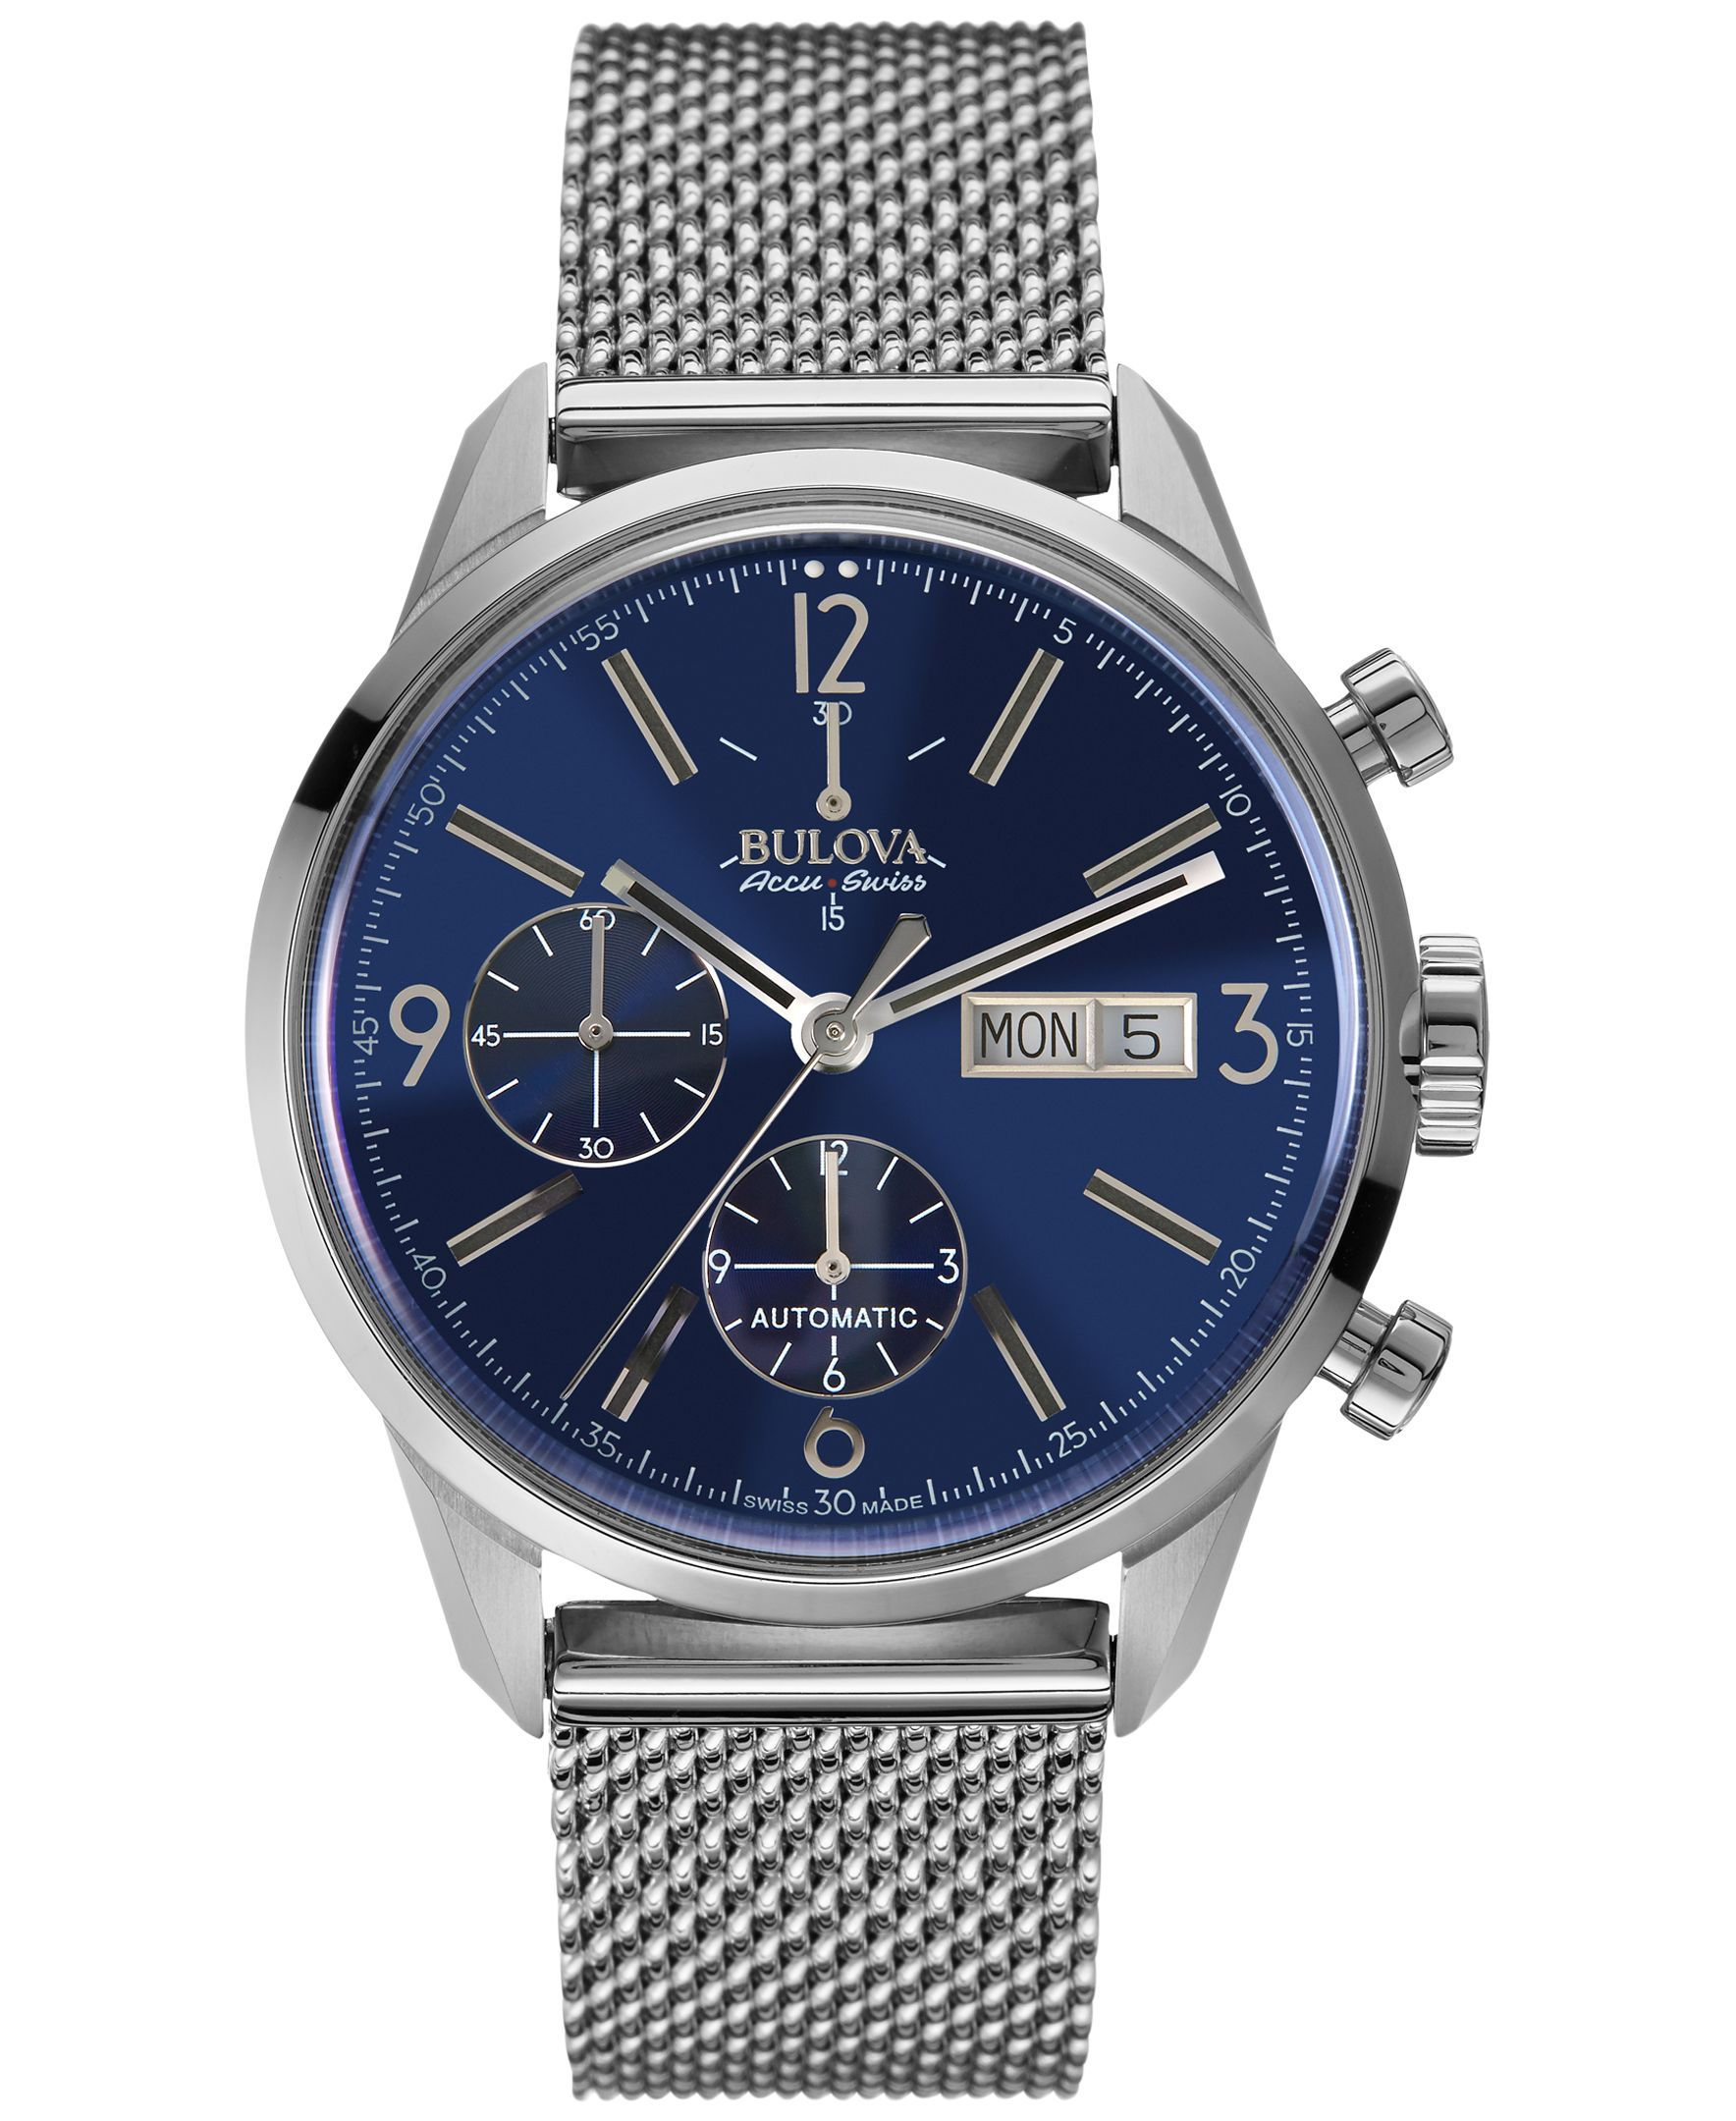 bulova accuswiss menu0027s automatic chronograph murren stainless steel mesh bracelet watch 41mm 63c117